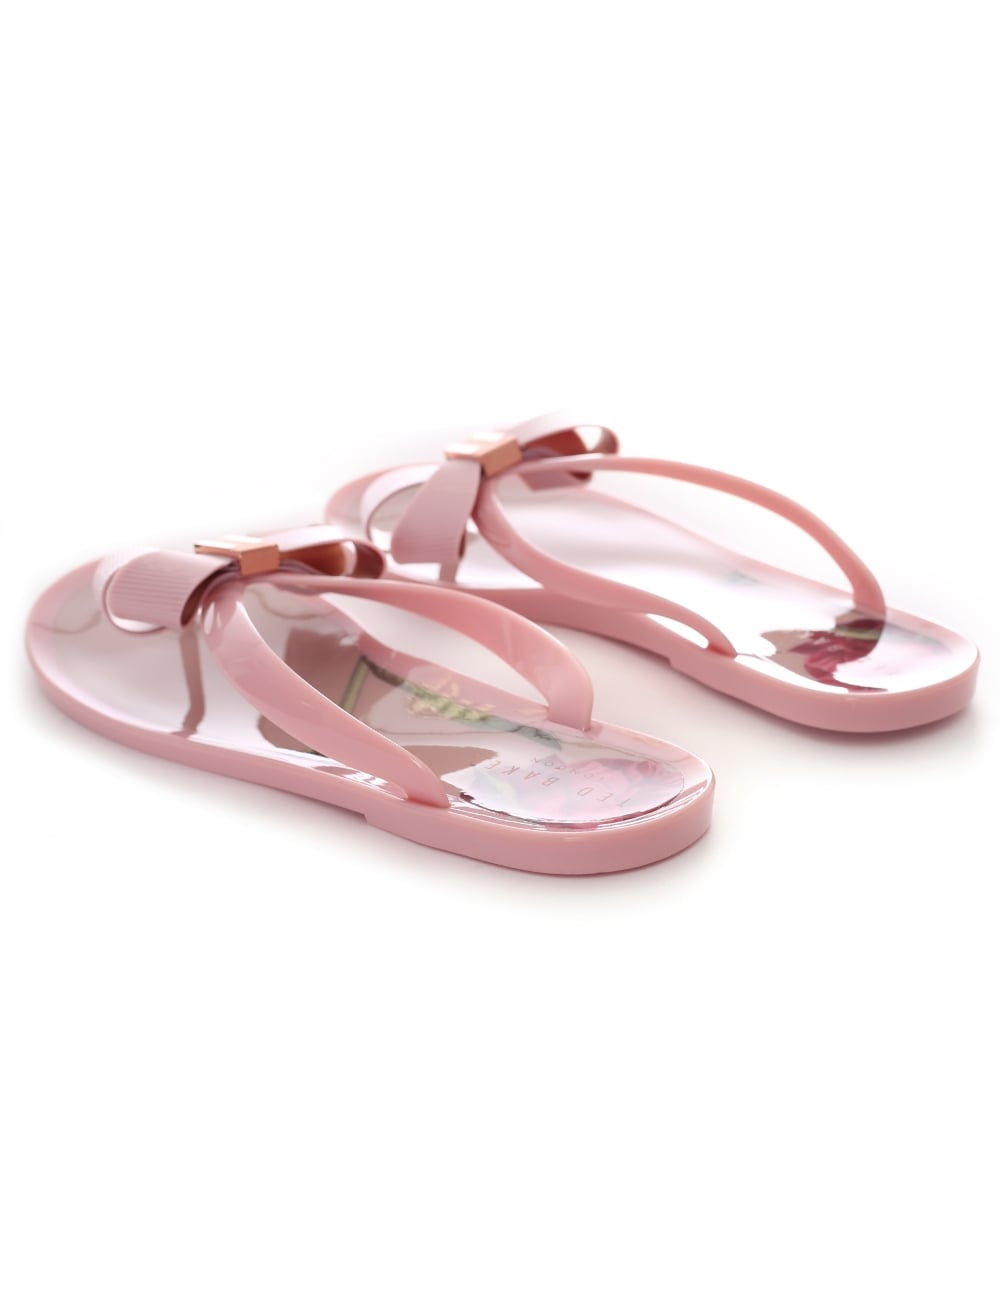 75f5b7644dac Ted Baker Women s Suszie Bow Detail Flip Flop